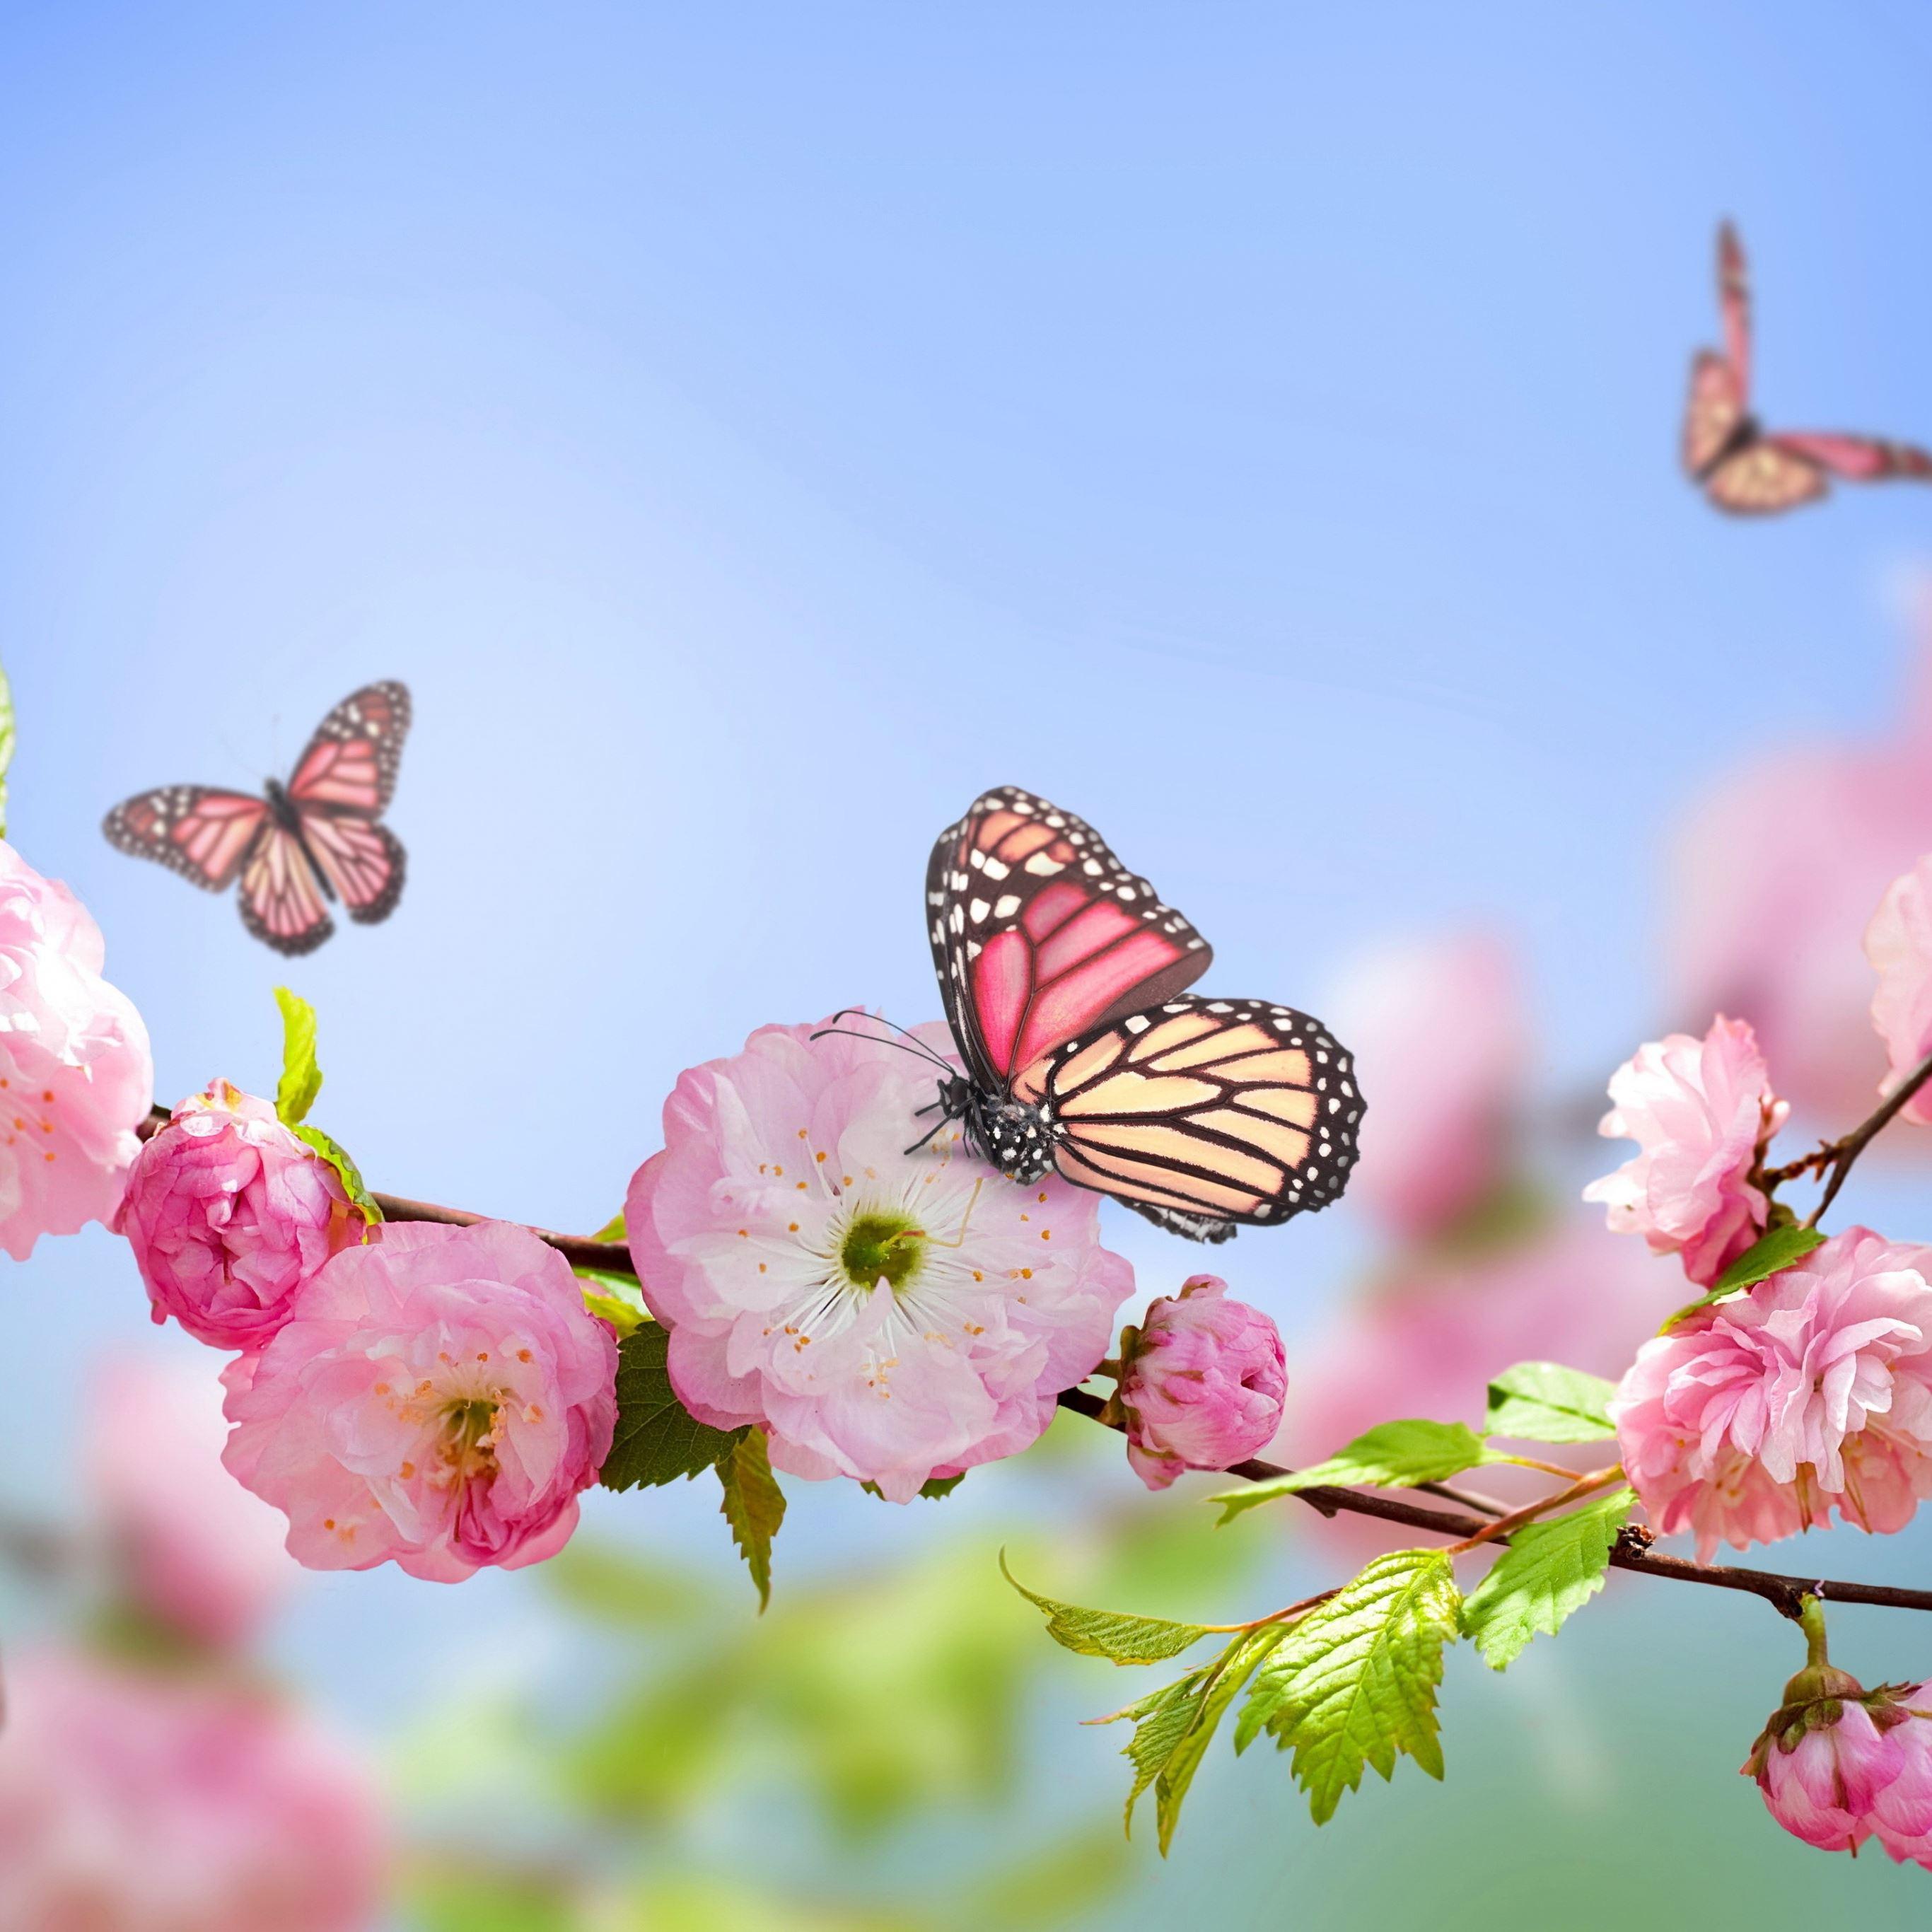 Flowers butterflies spring bloom branch iPad Pro wallpaper